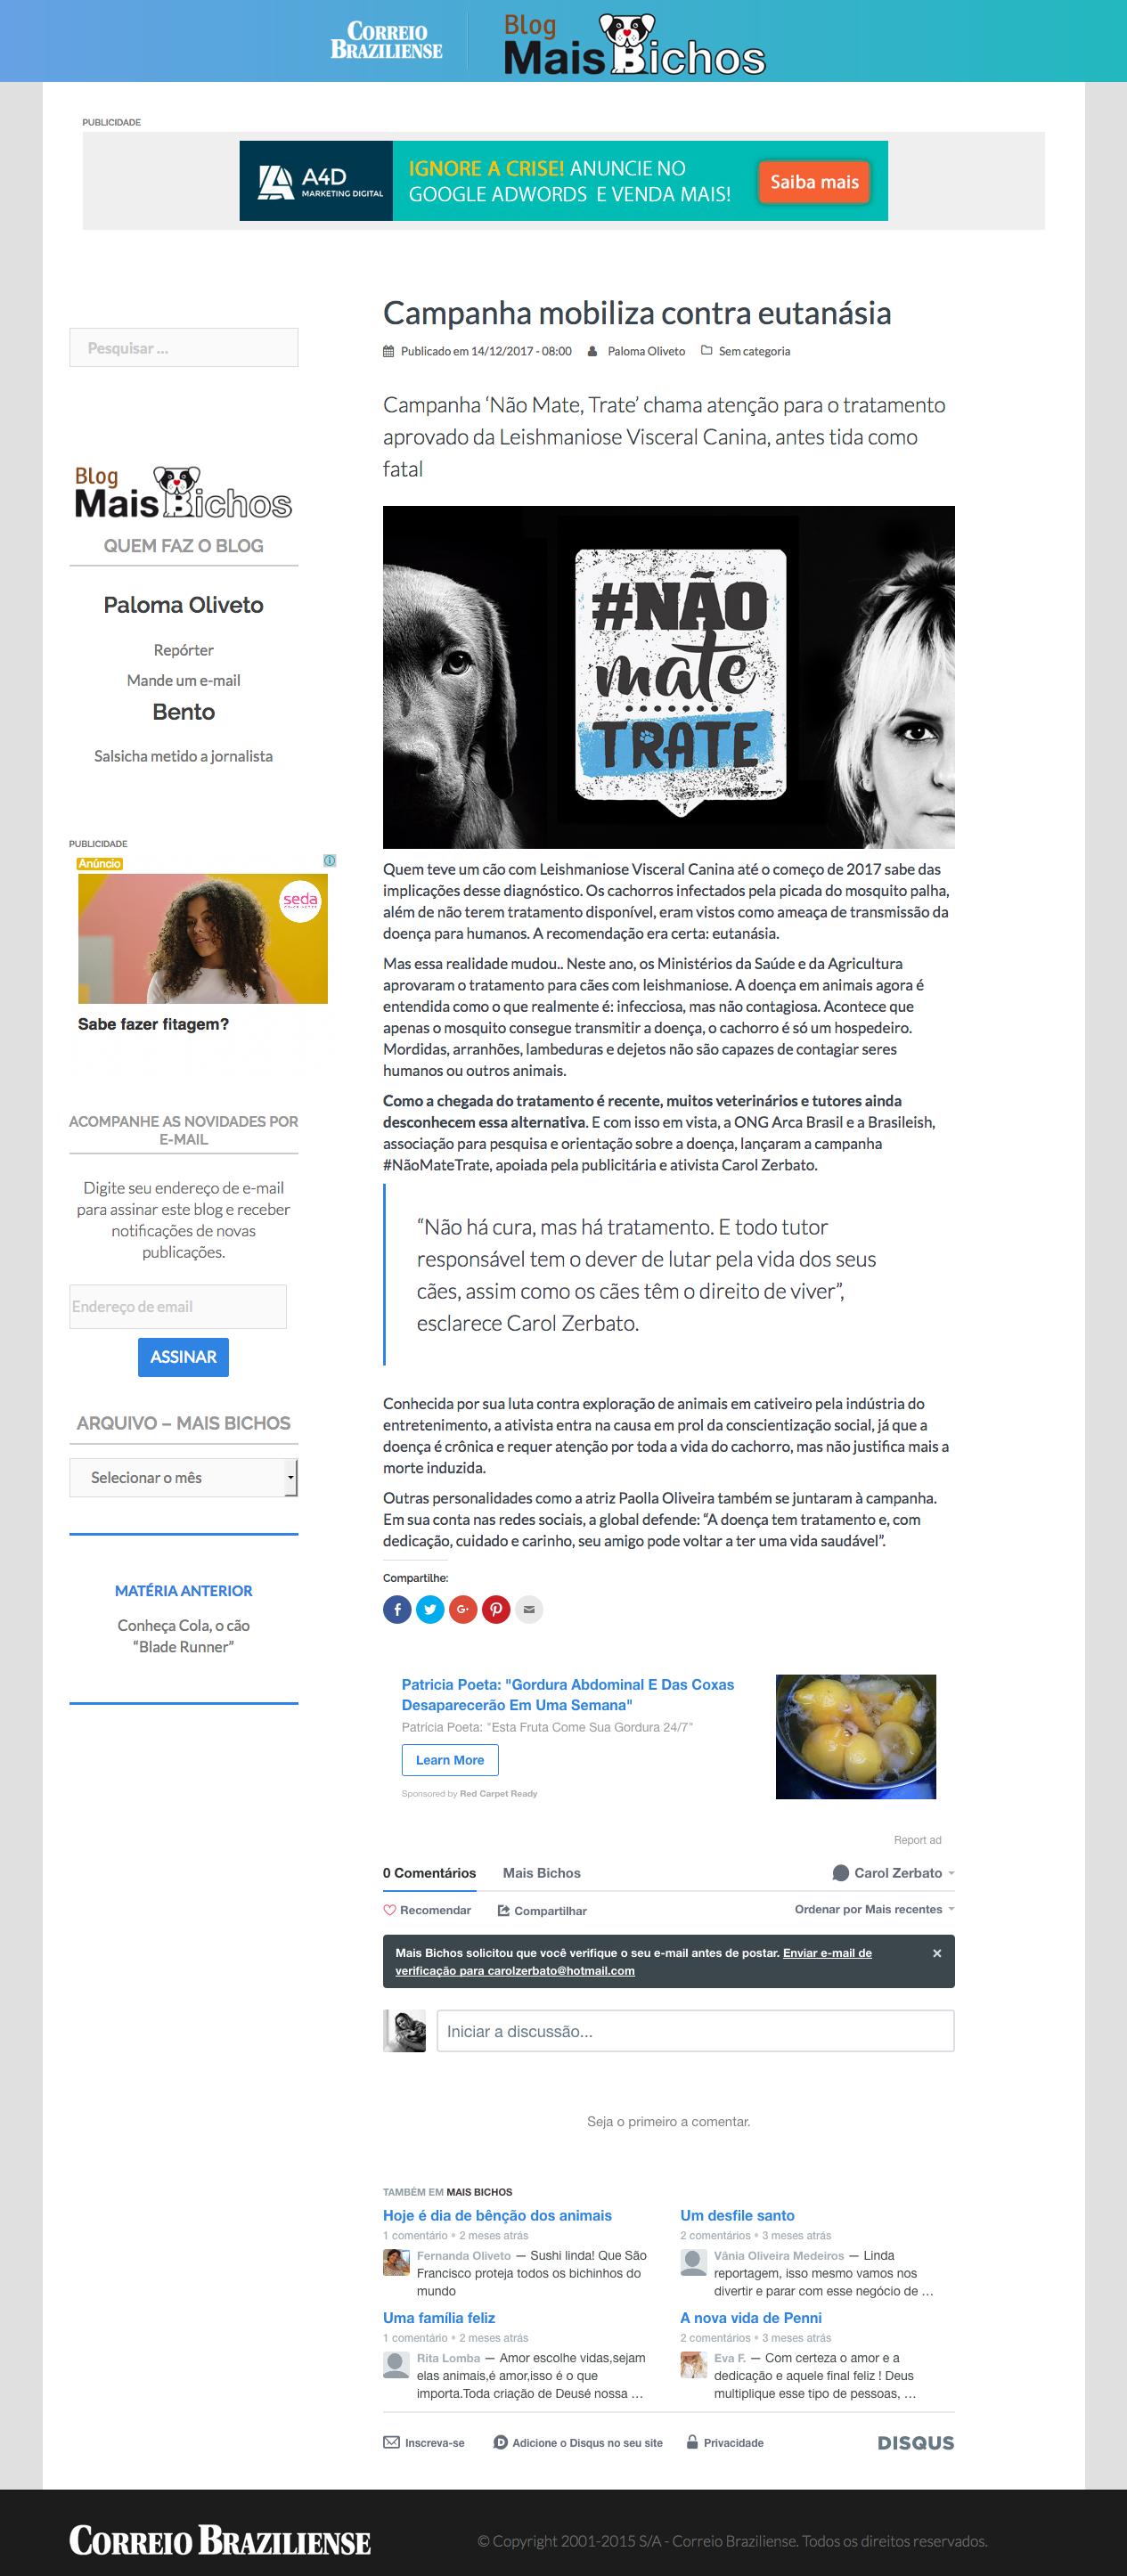 FireShot Capture 85 - Campanha mobil__ - http___blogs.correiobraziliense.co